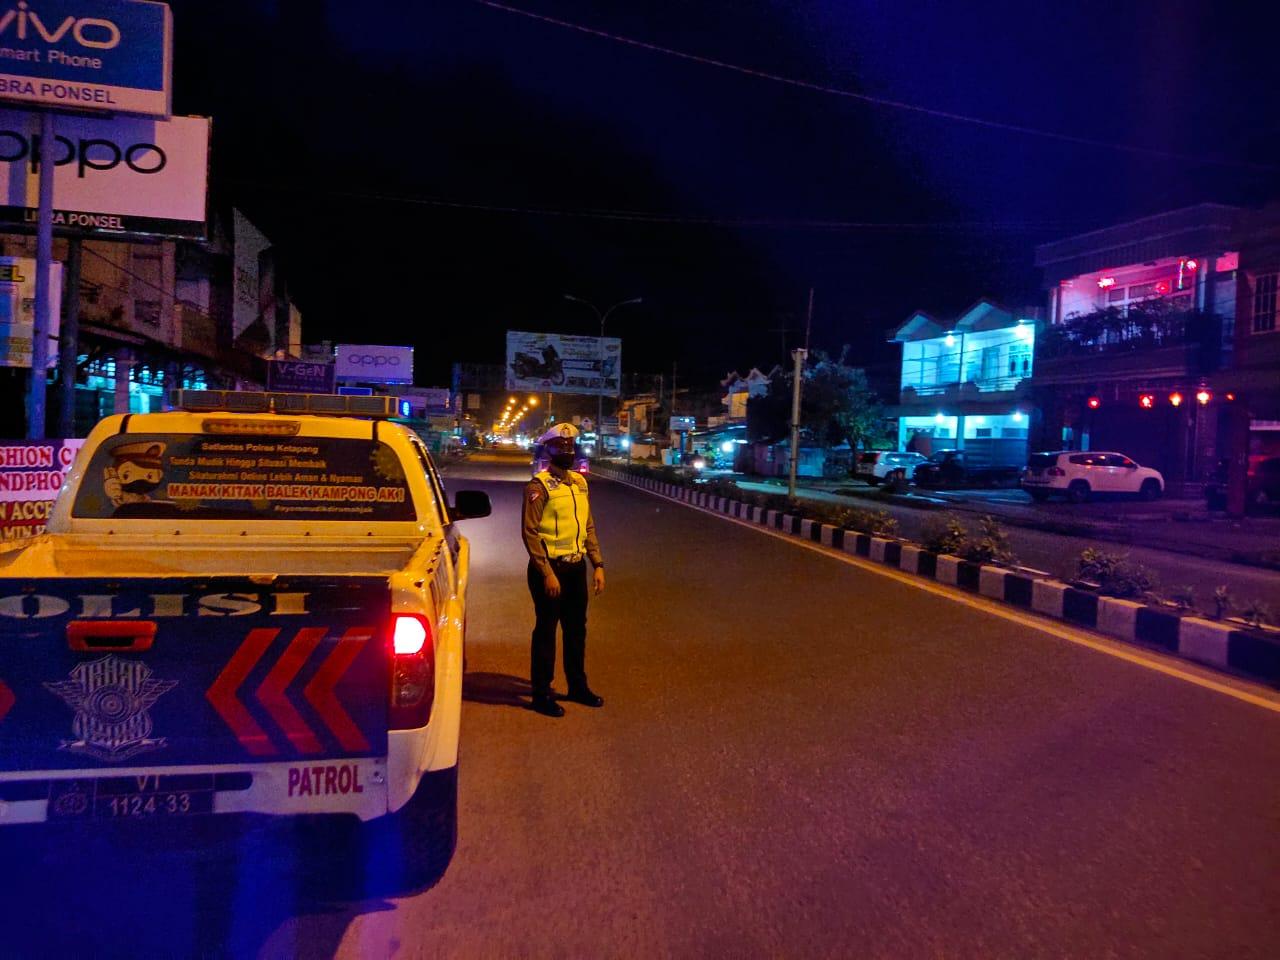 Gencar Patroli di Malam Hari ini yang Dilakukan Satlantas Ketapang